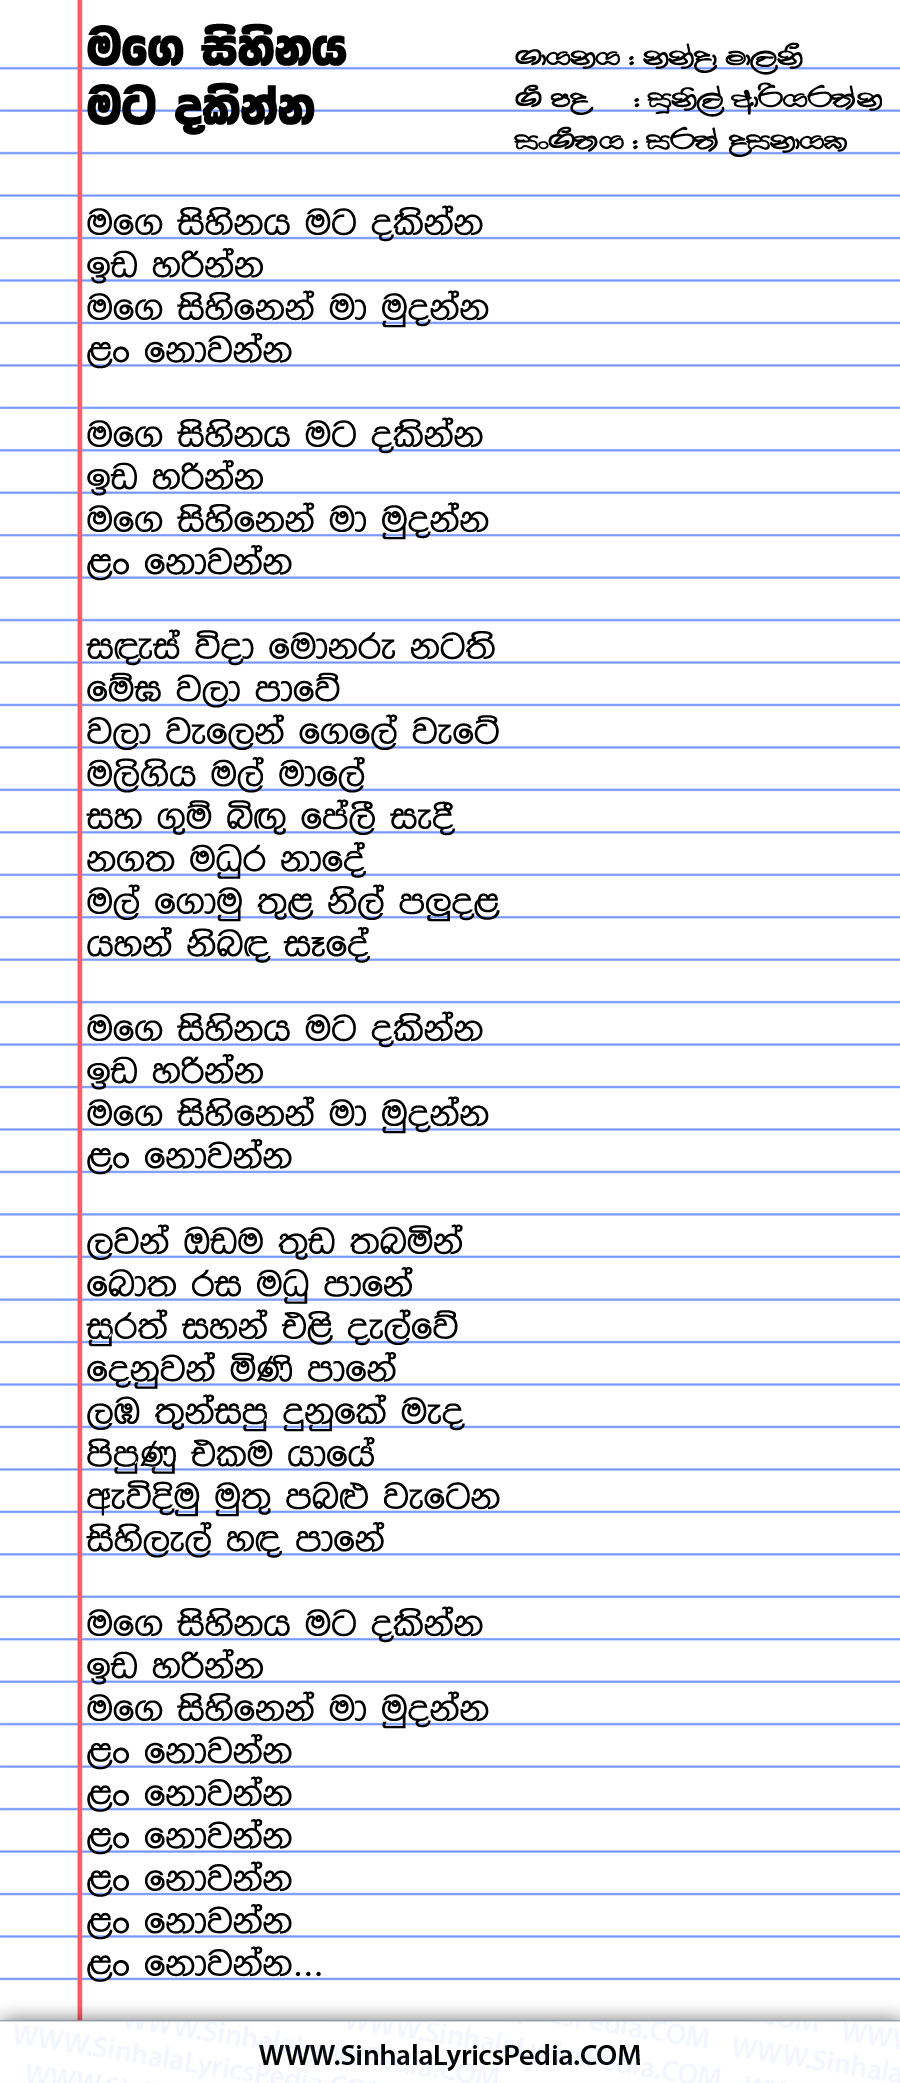 Mage Sihinaya Mata Dakinna Song Lyrics